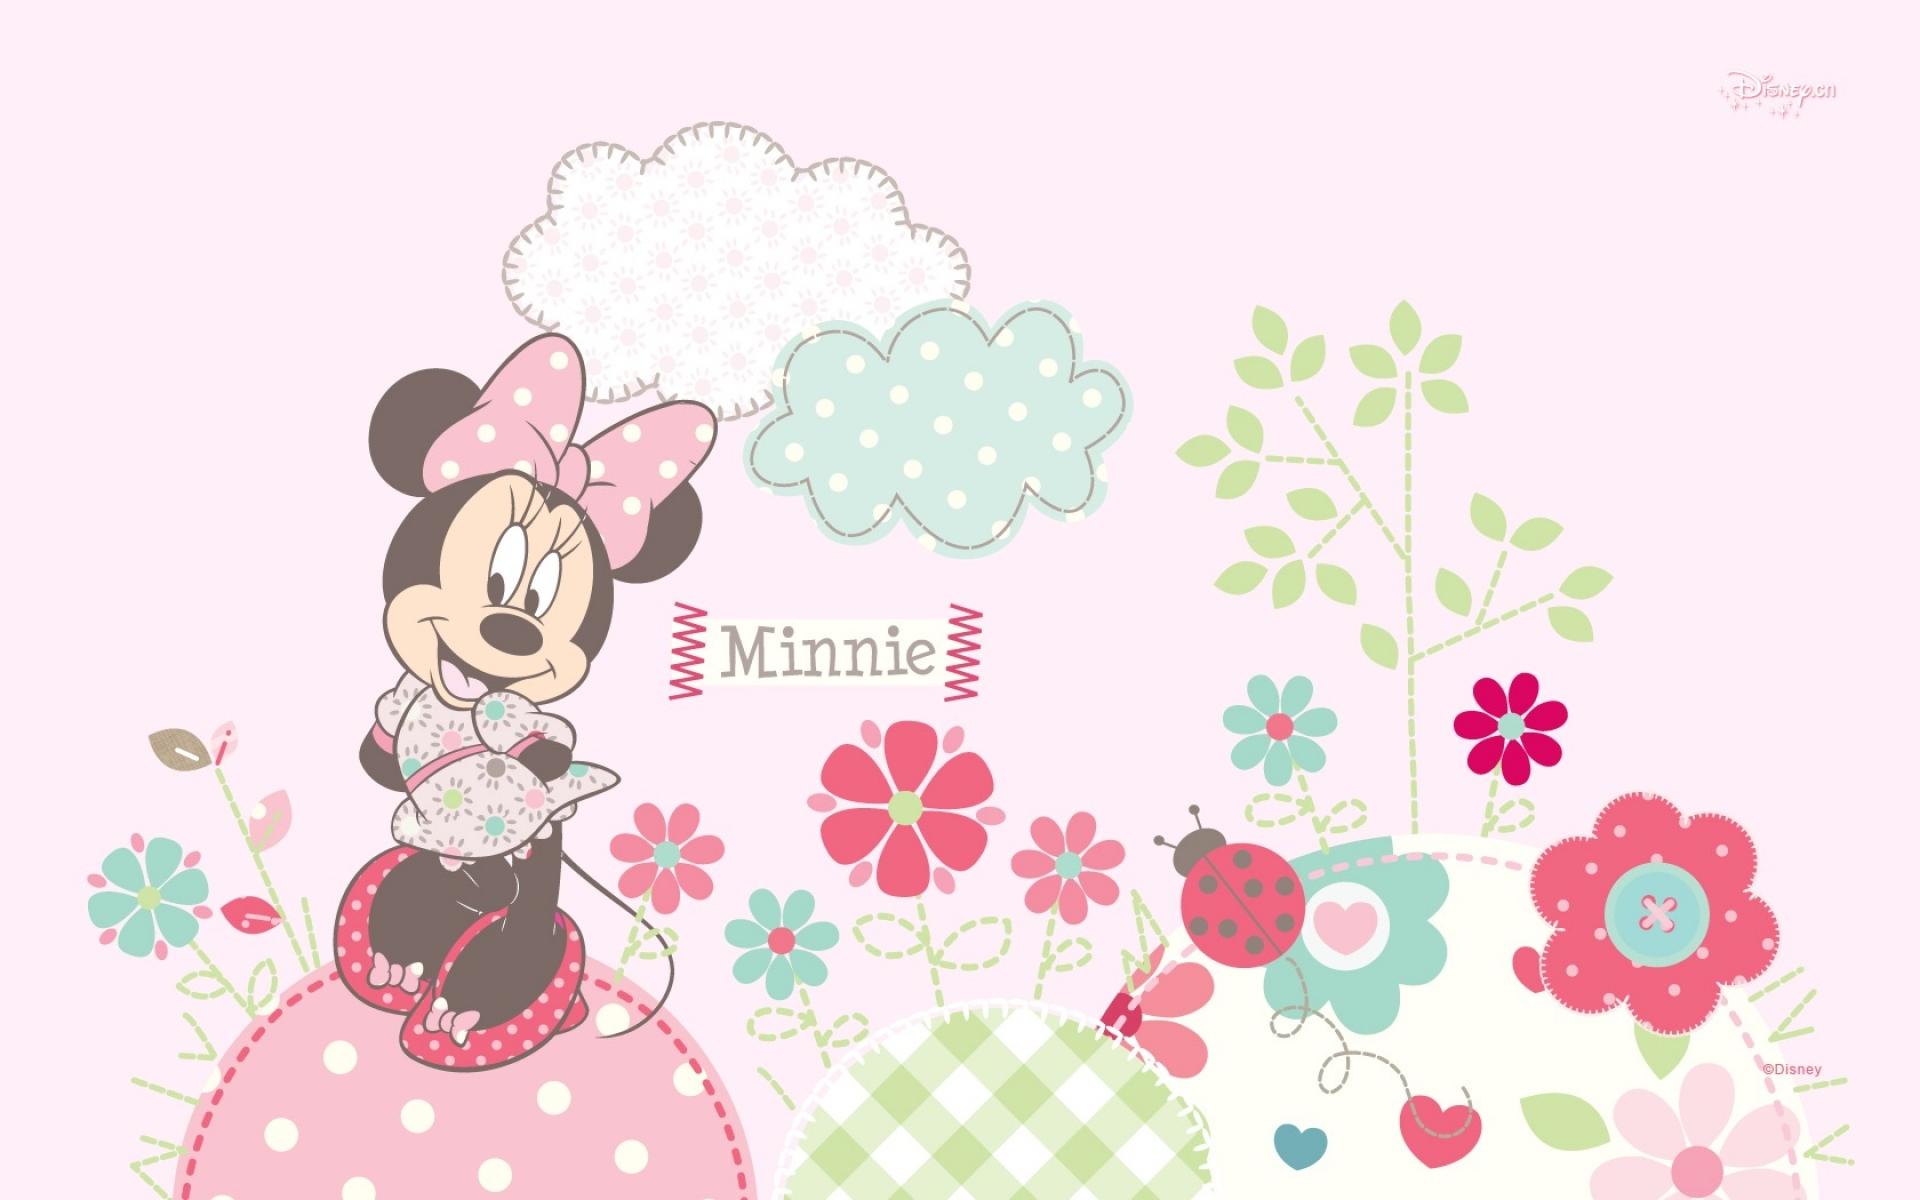 1920x1200px Minnie Mouse Desktop Wallpaper Wallpapersafari